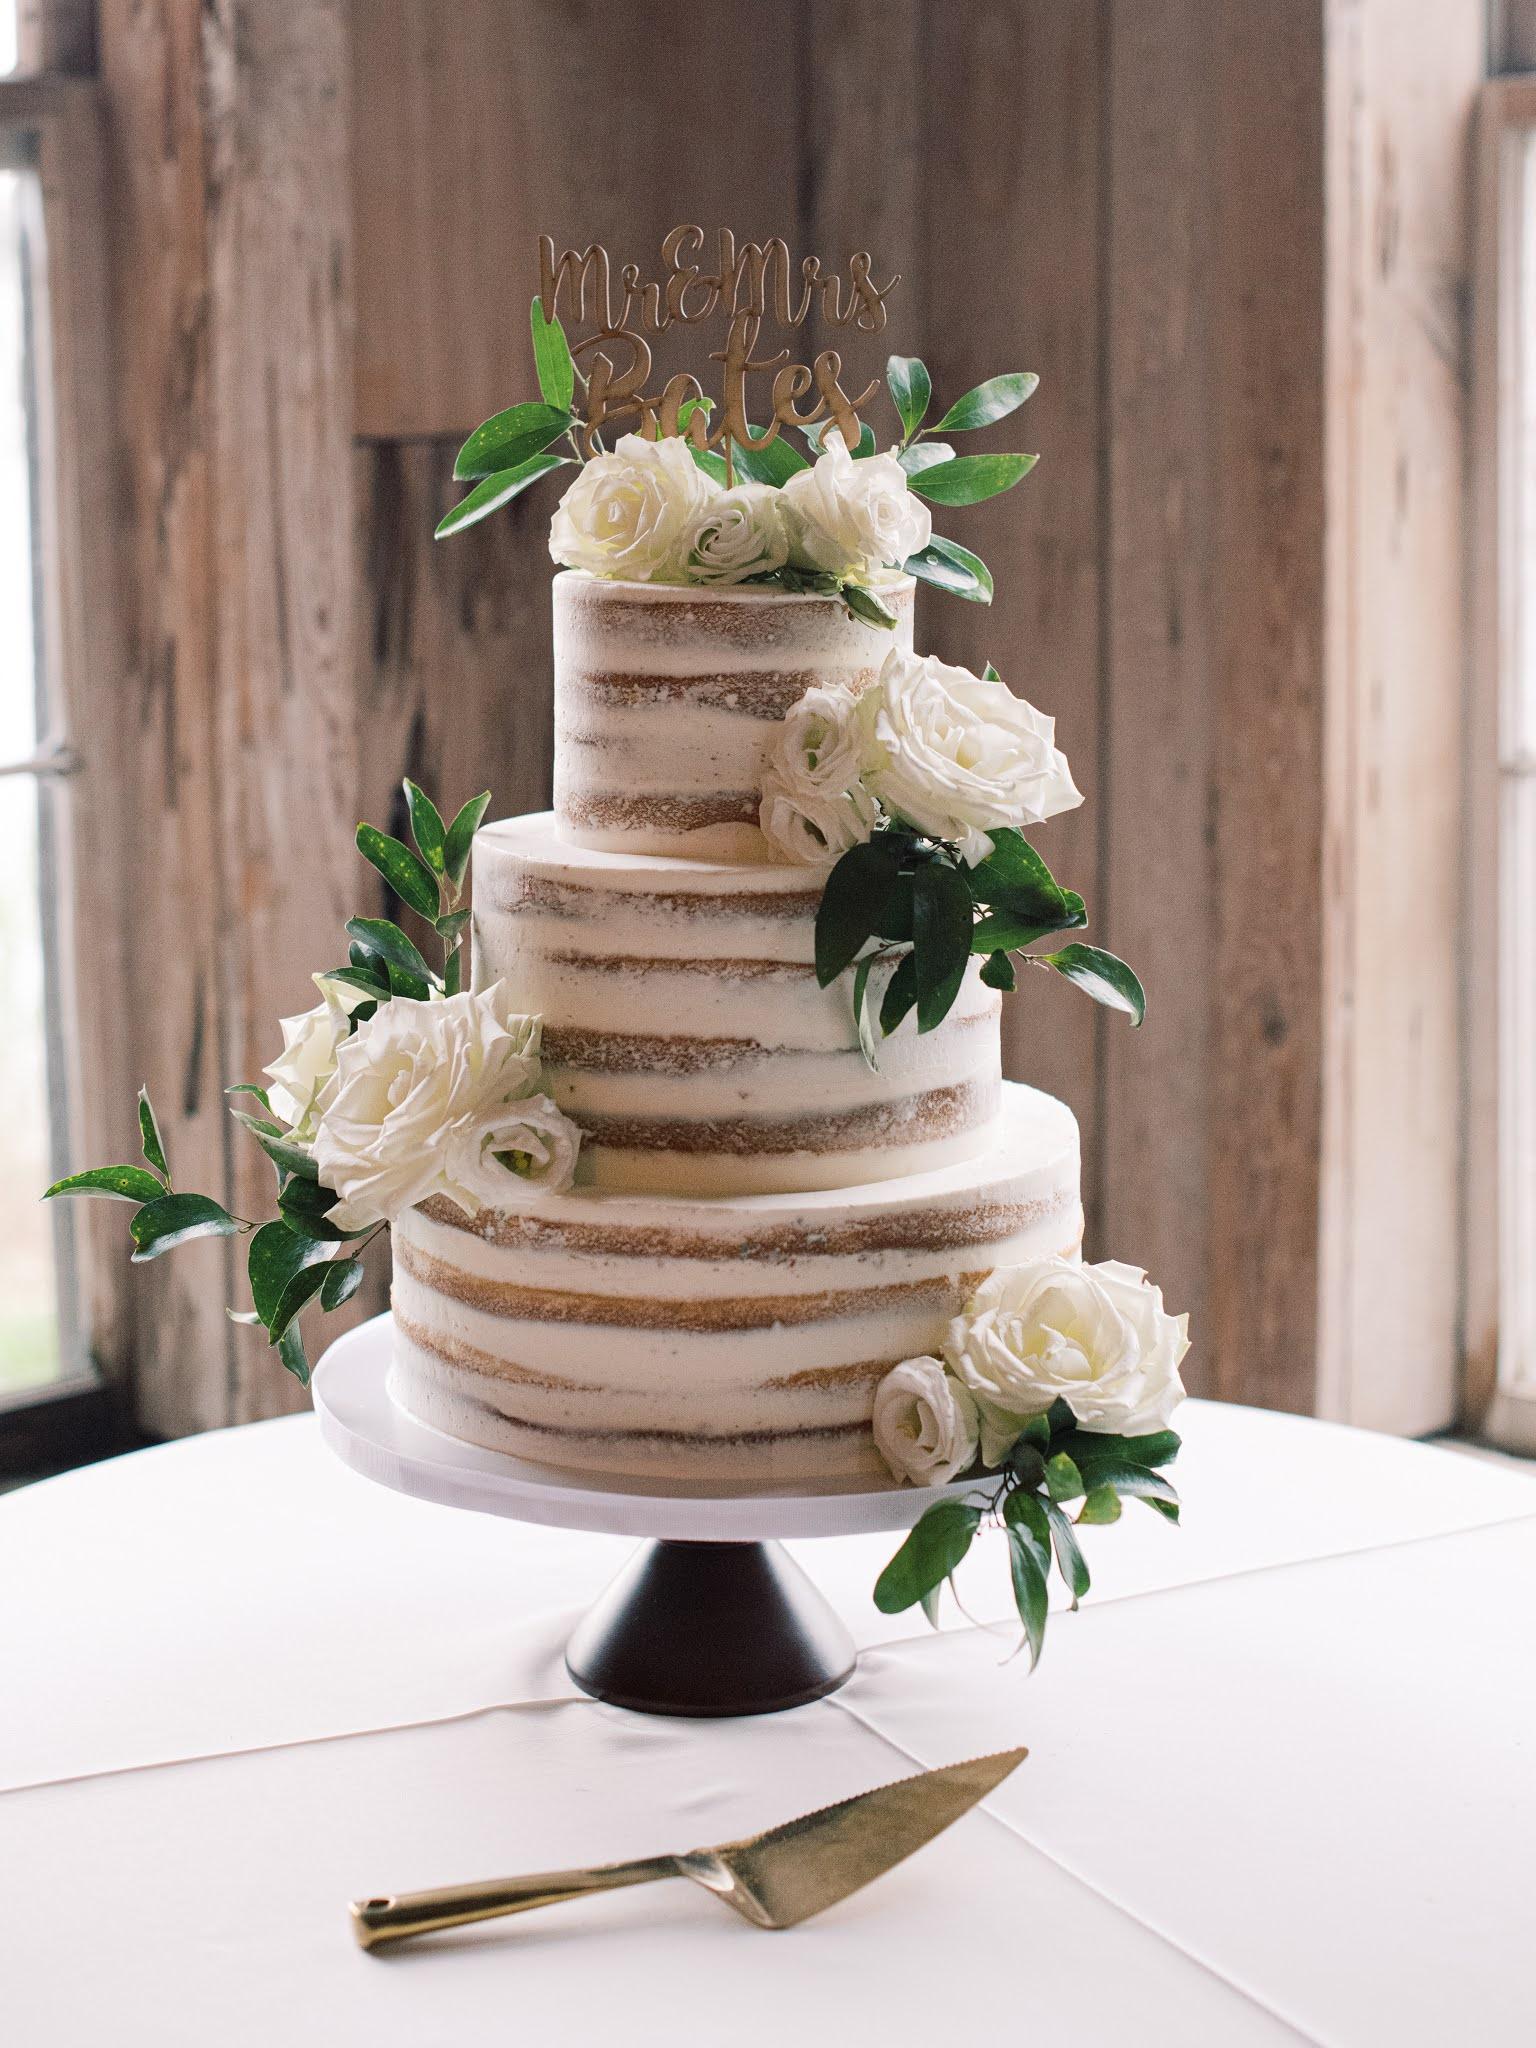 Charleston Wedding Cake Ashley Bakery - Chasing Cinderella